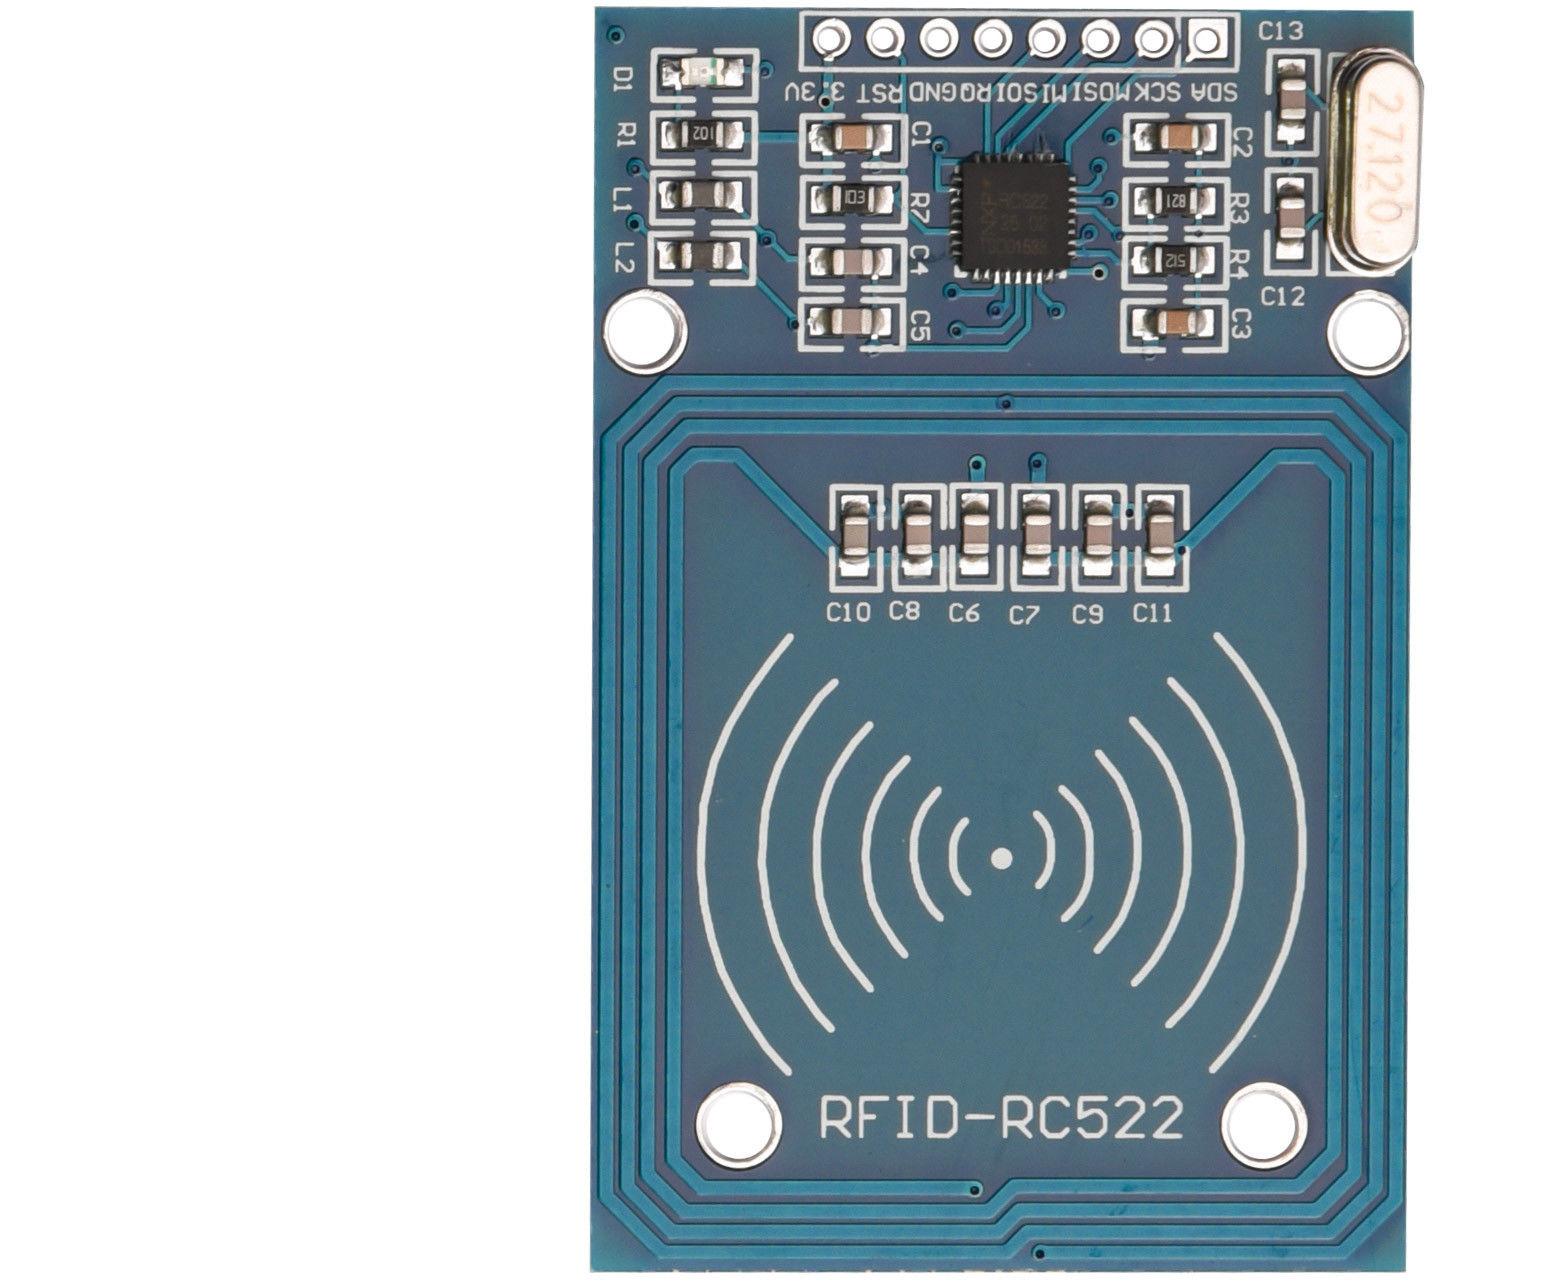 Arduino RC522 Basics